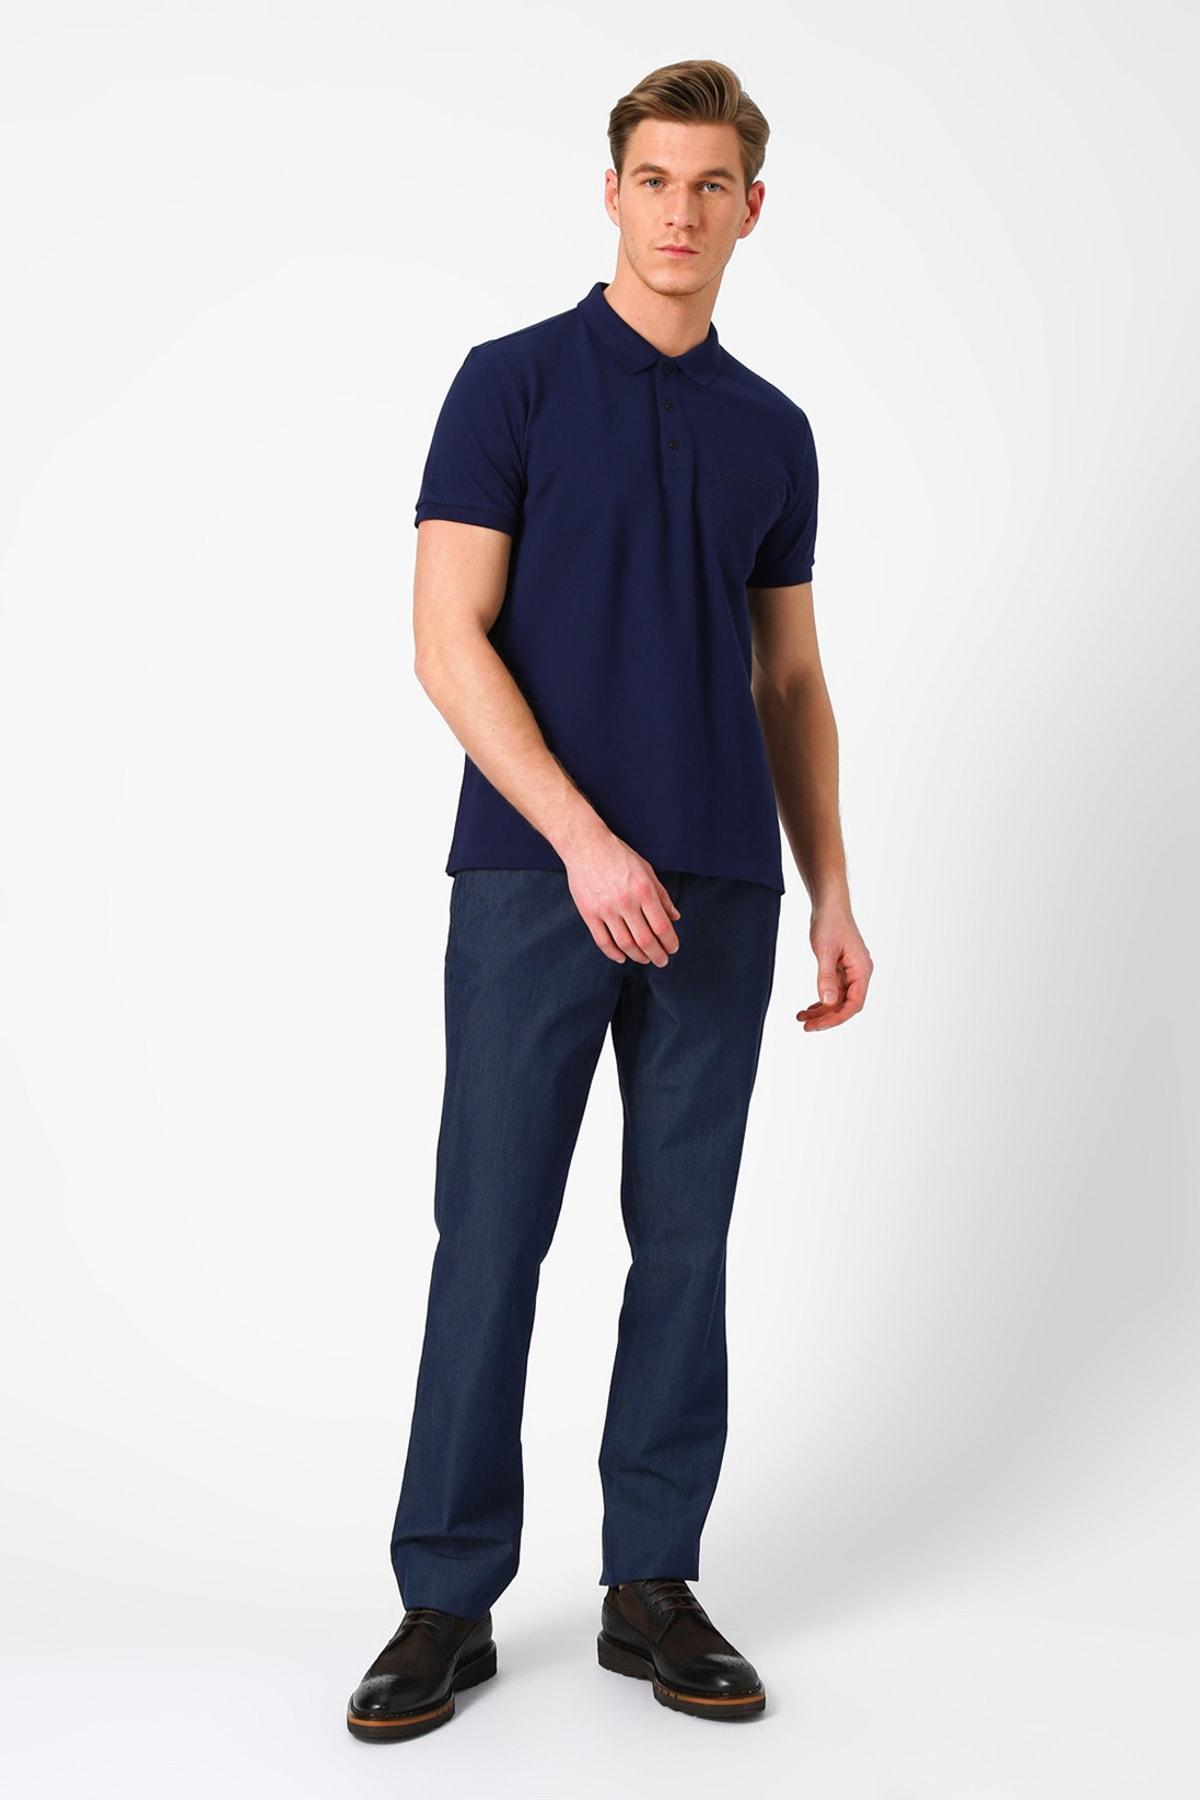 Cotton Bar Erkek Lacivert Pantolon 503155005 1